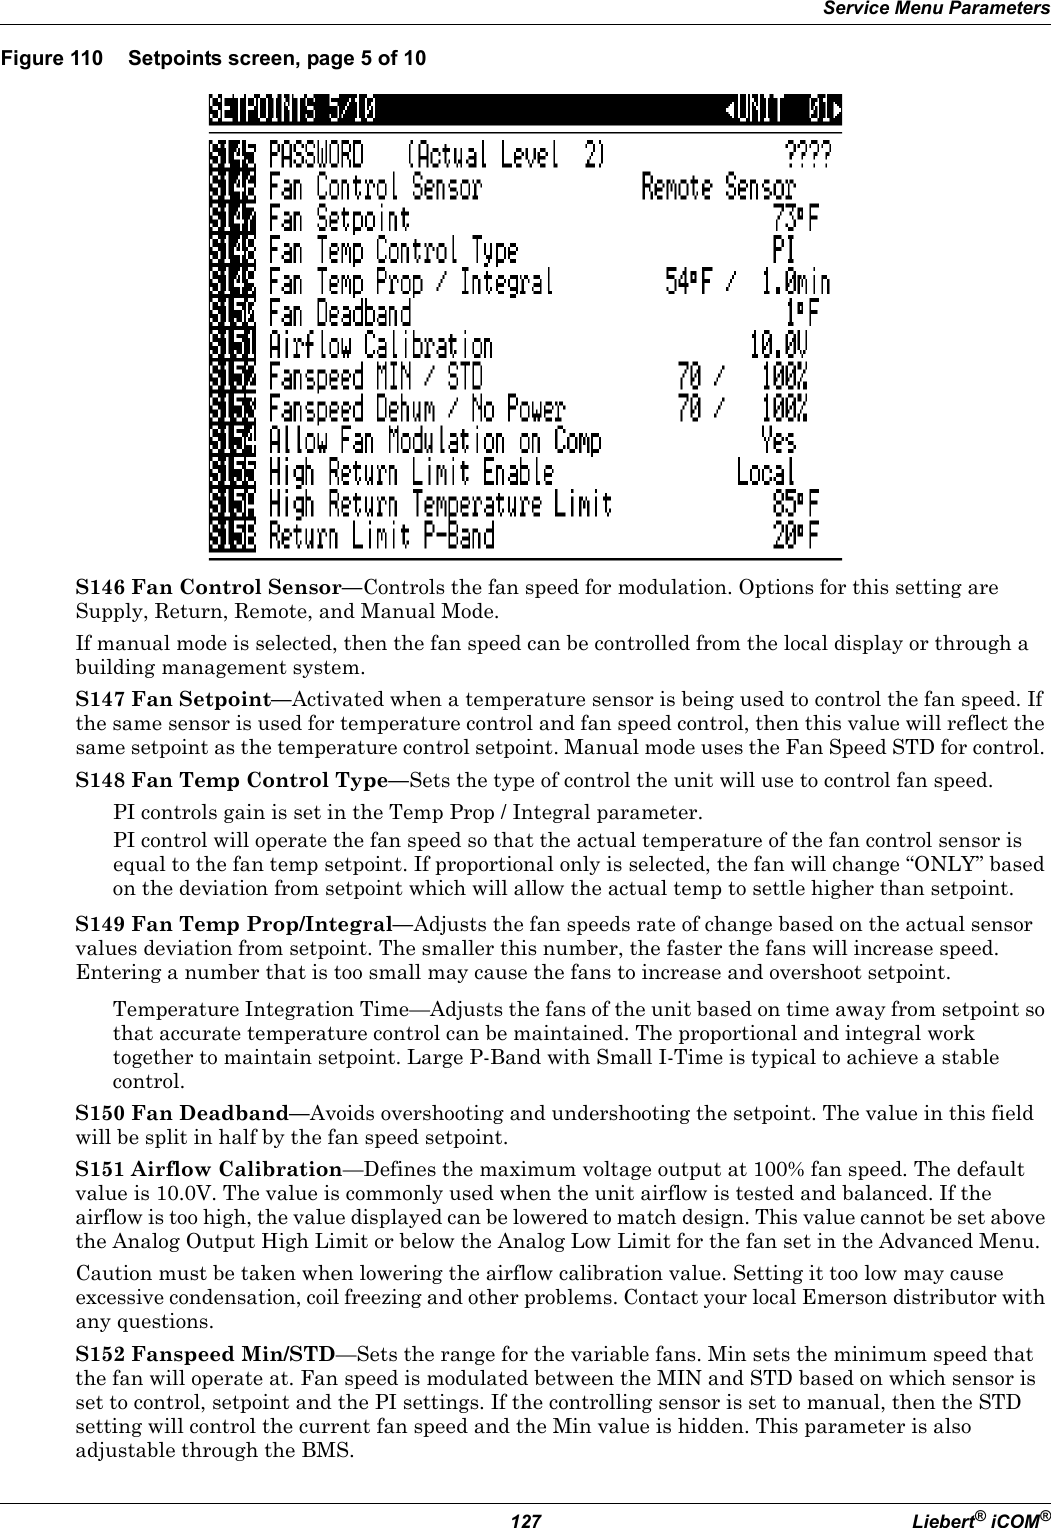 Emerson Liebert Icom Users Manual